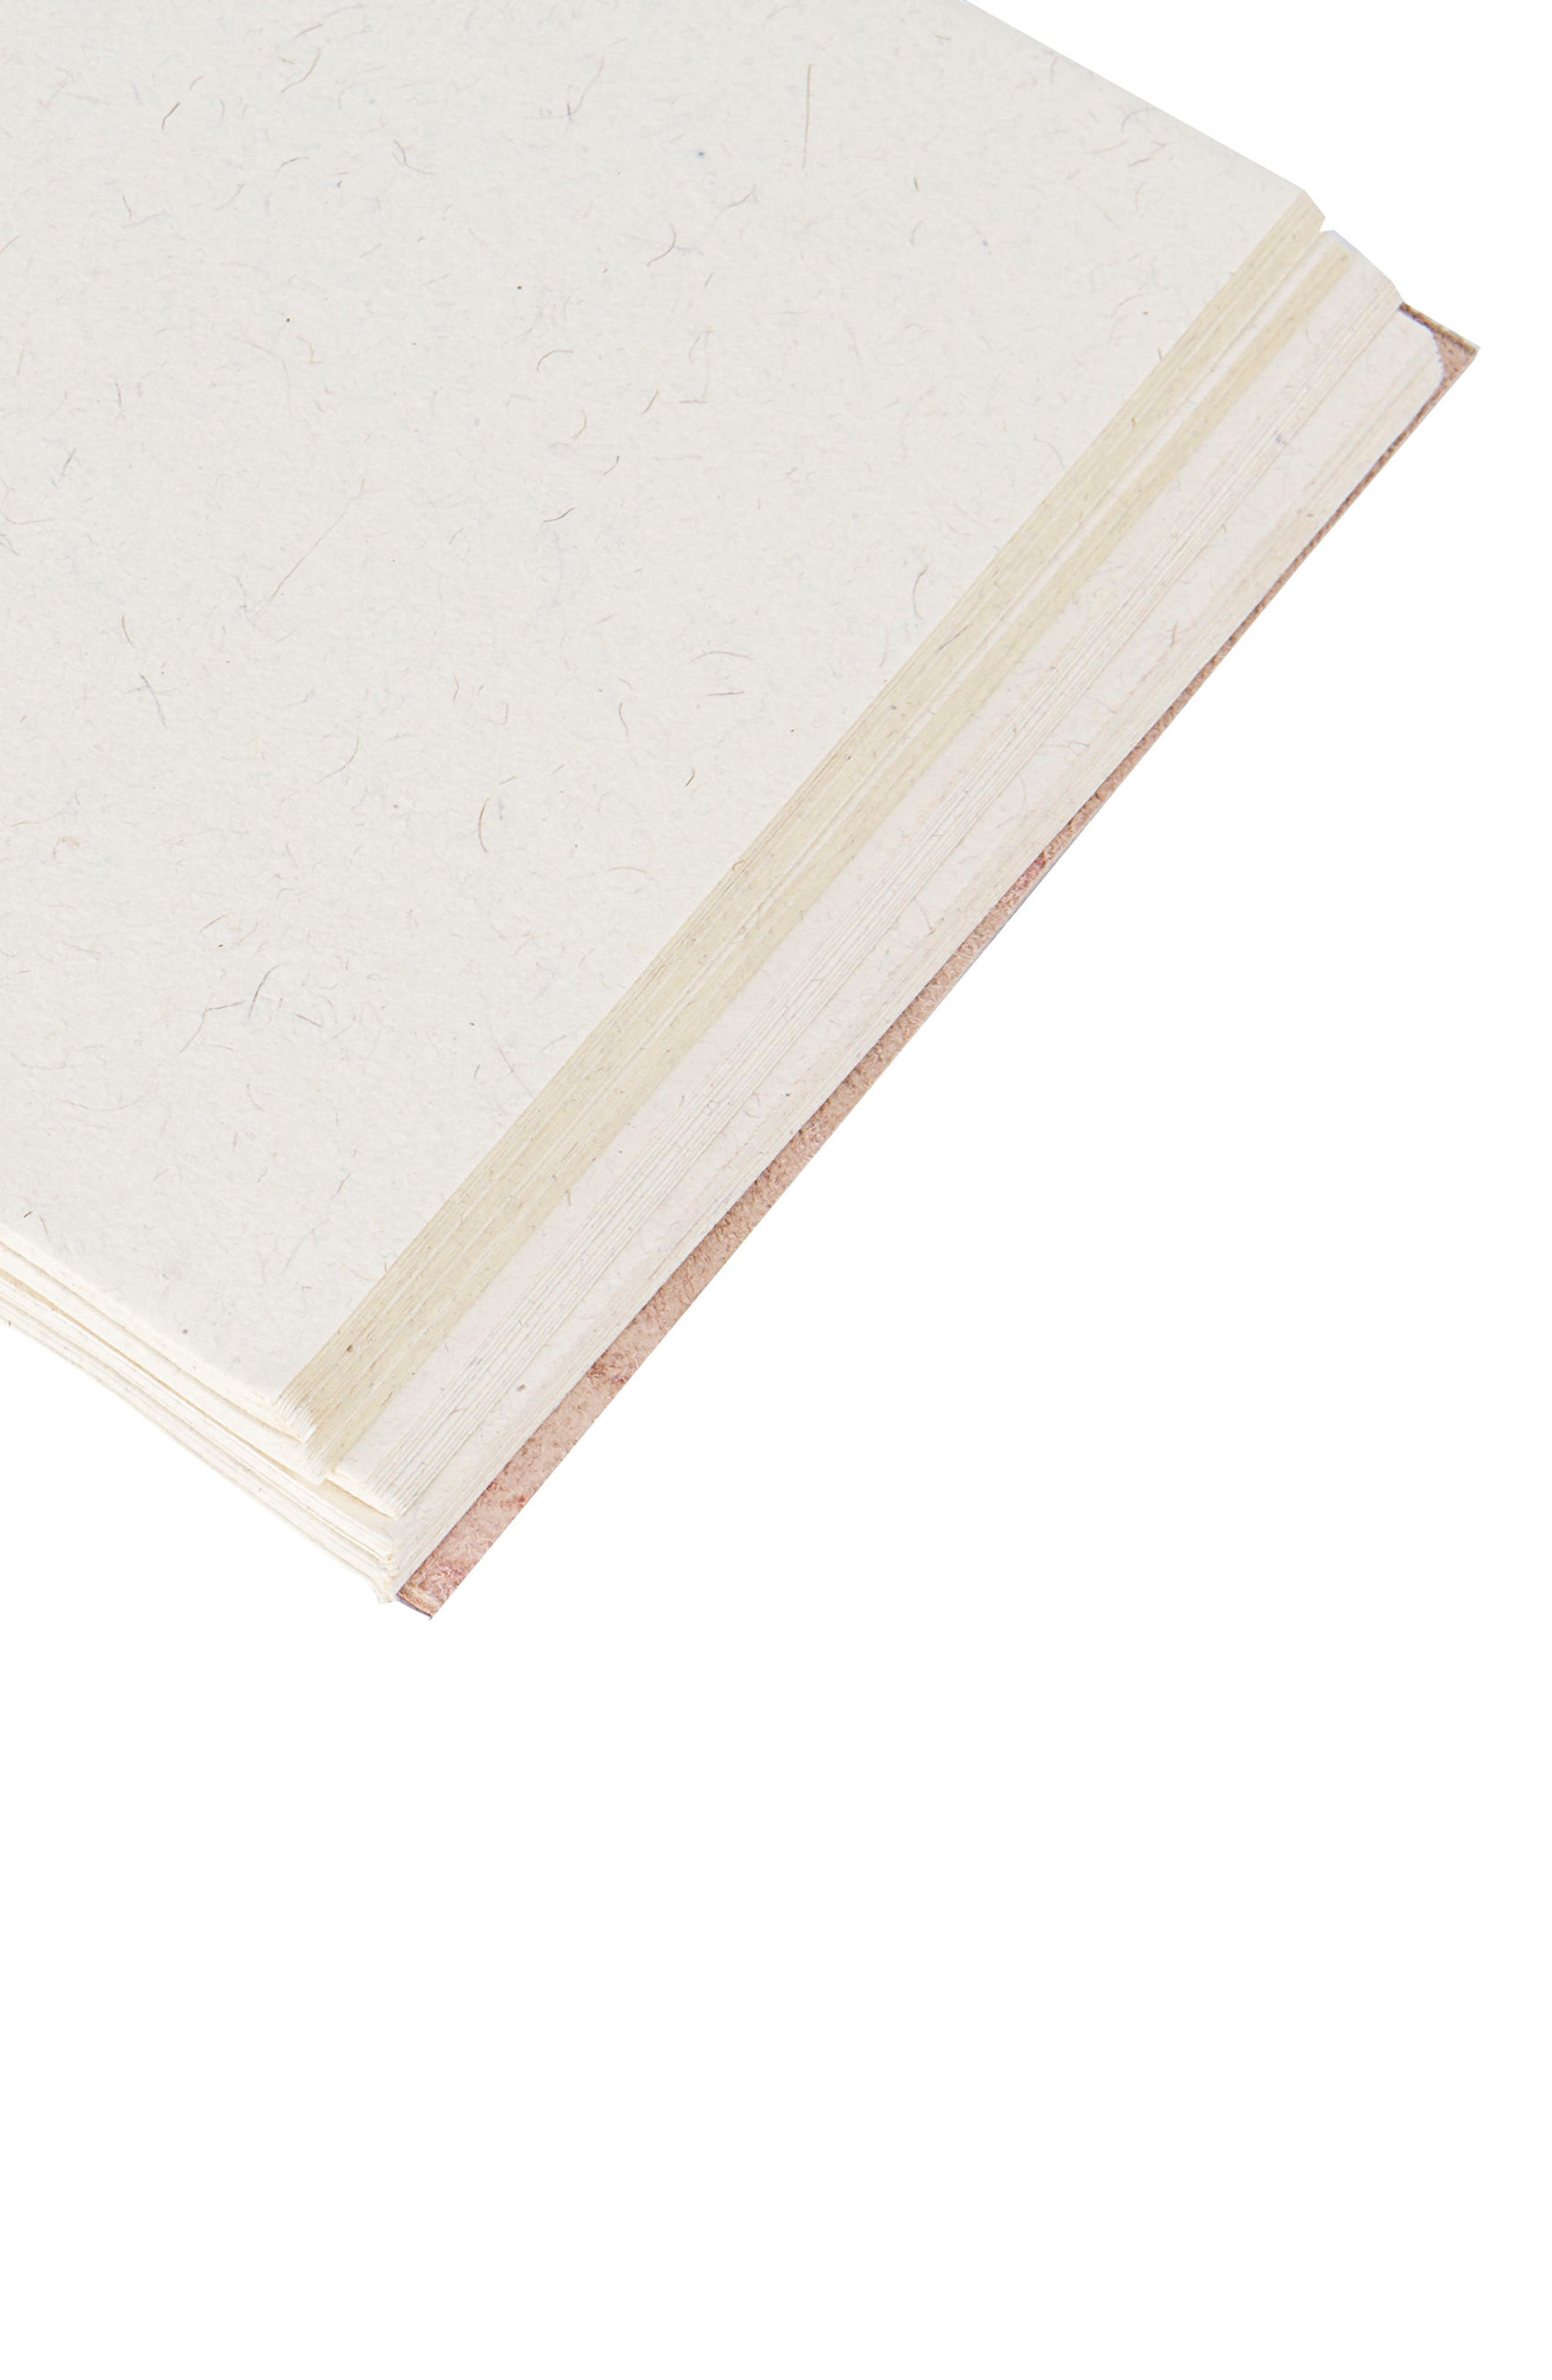 Monogram Leather Guest Book,                             Alternate thumbnail 2, color,                             710